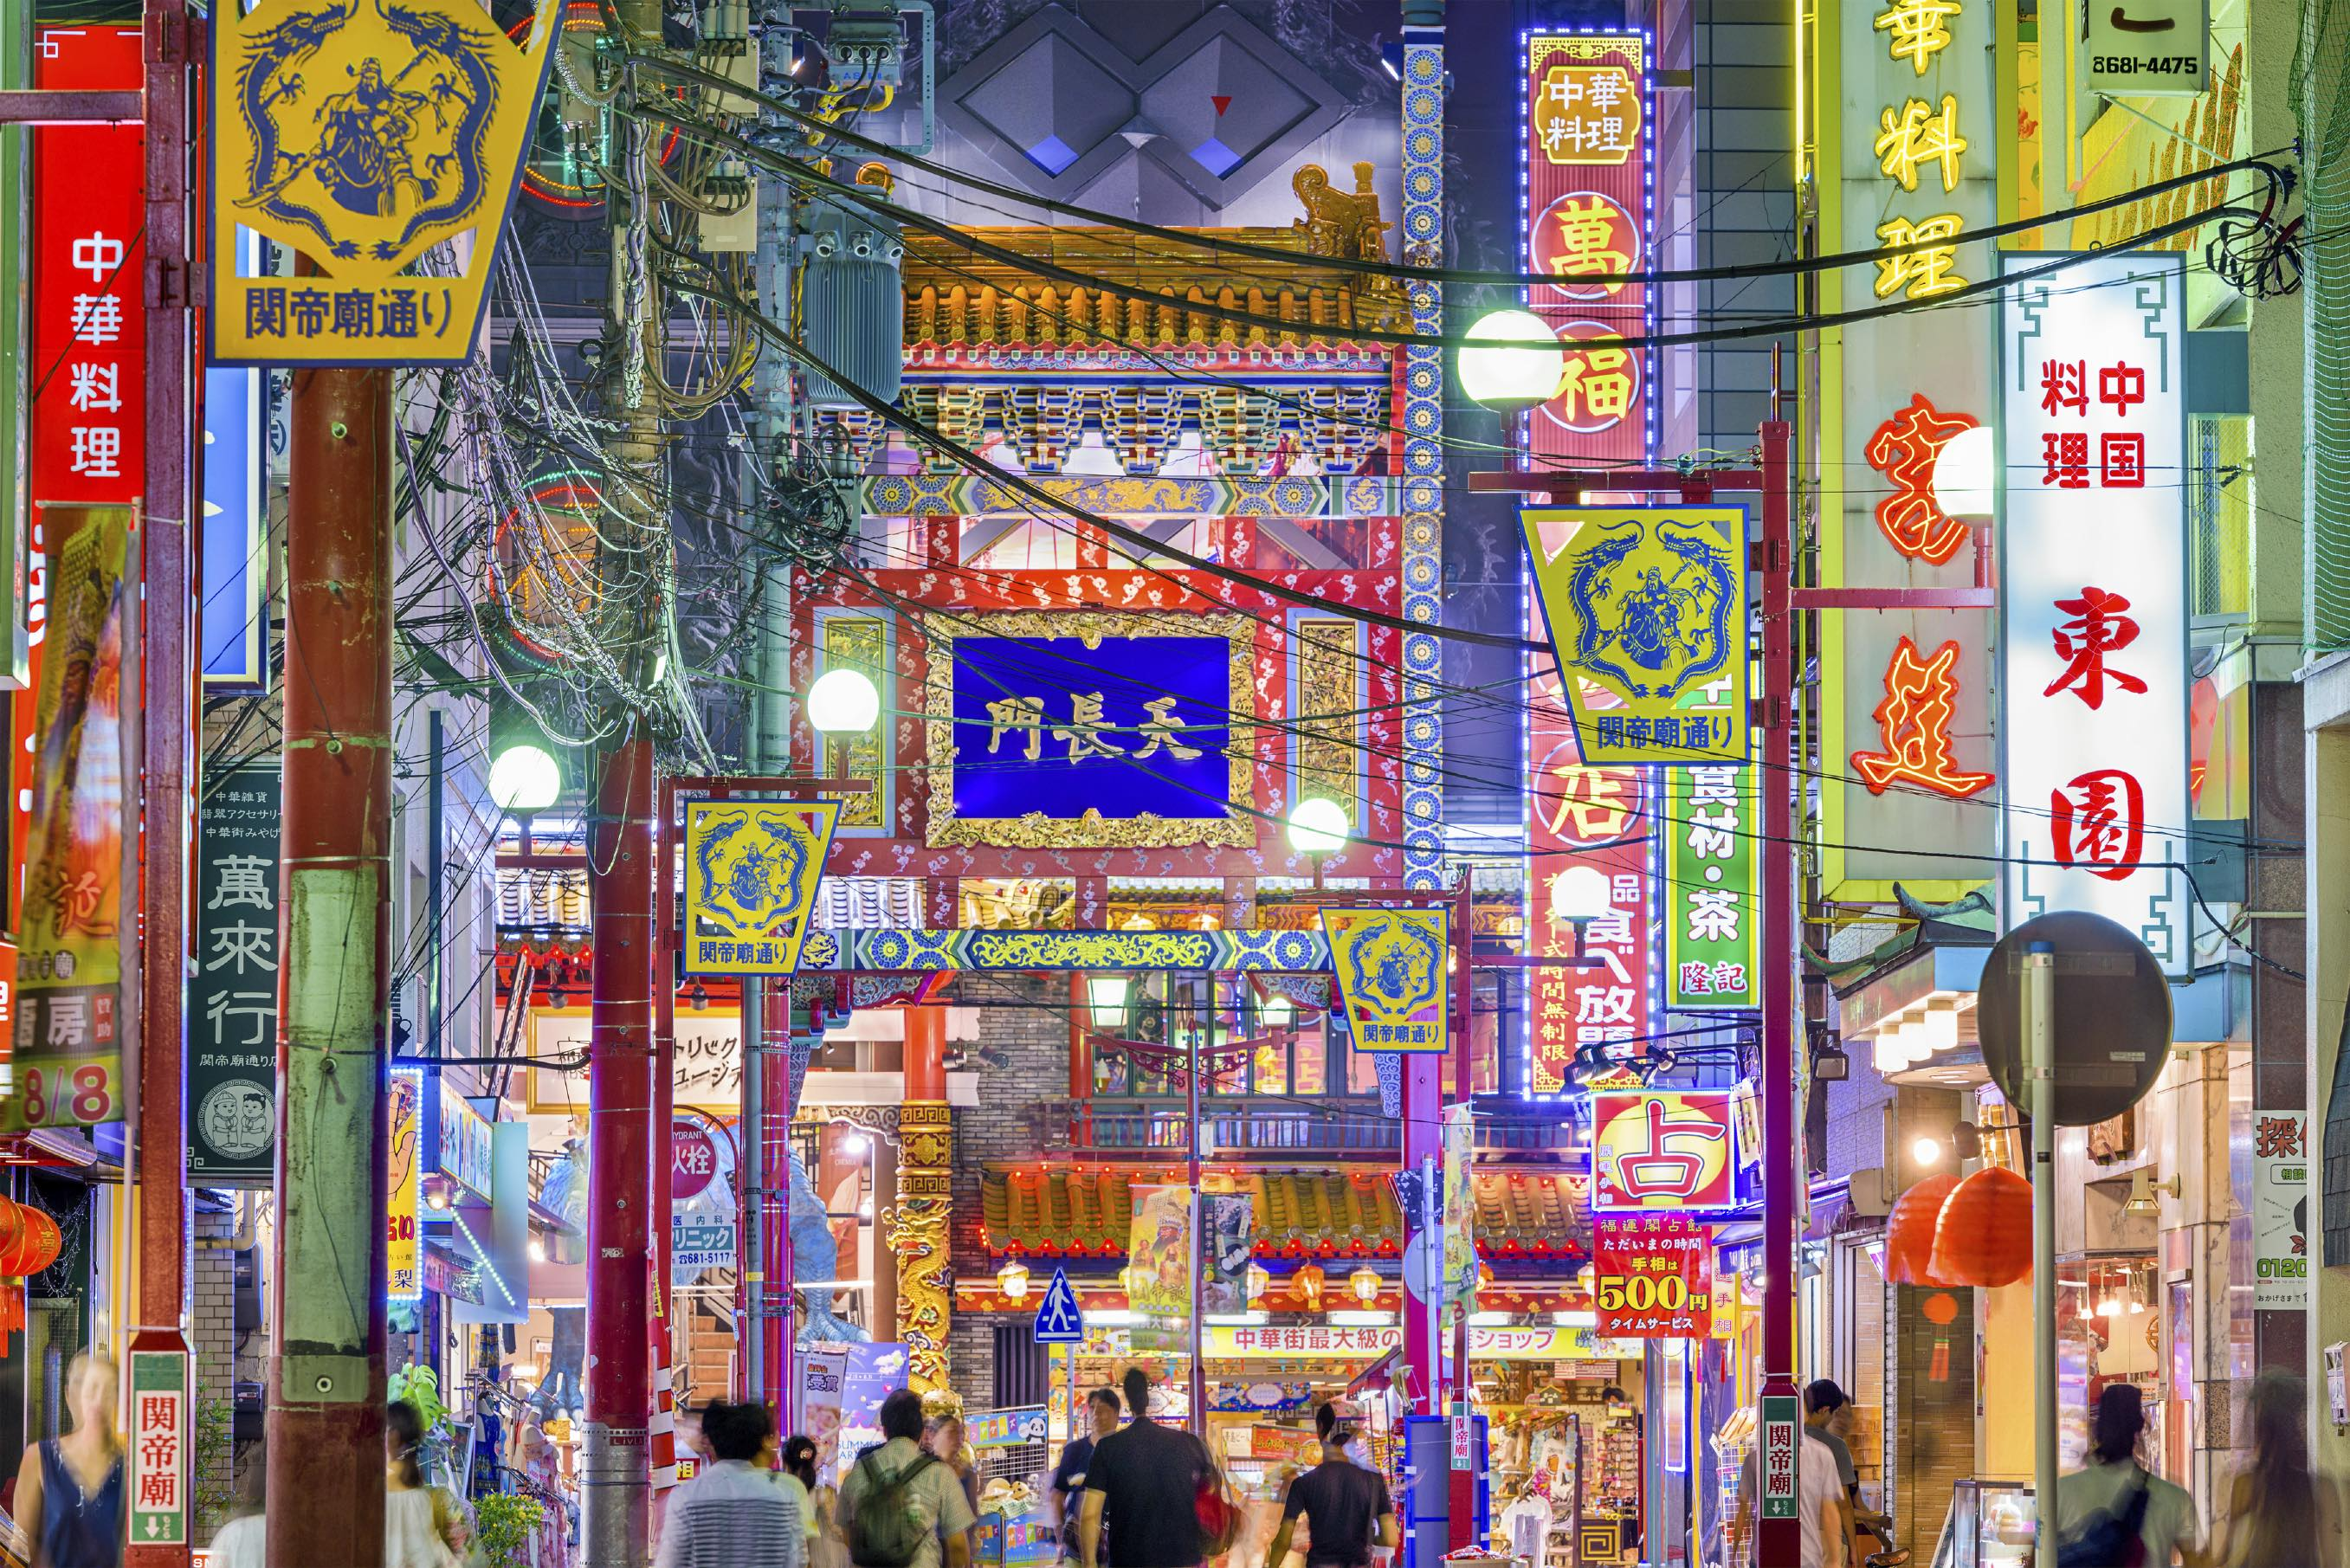 Yokohama Gaijinpot Travel